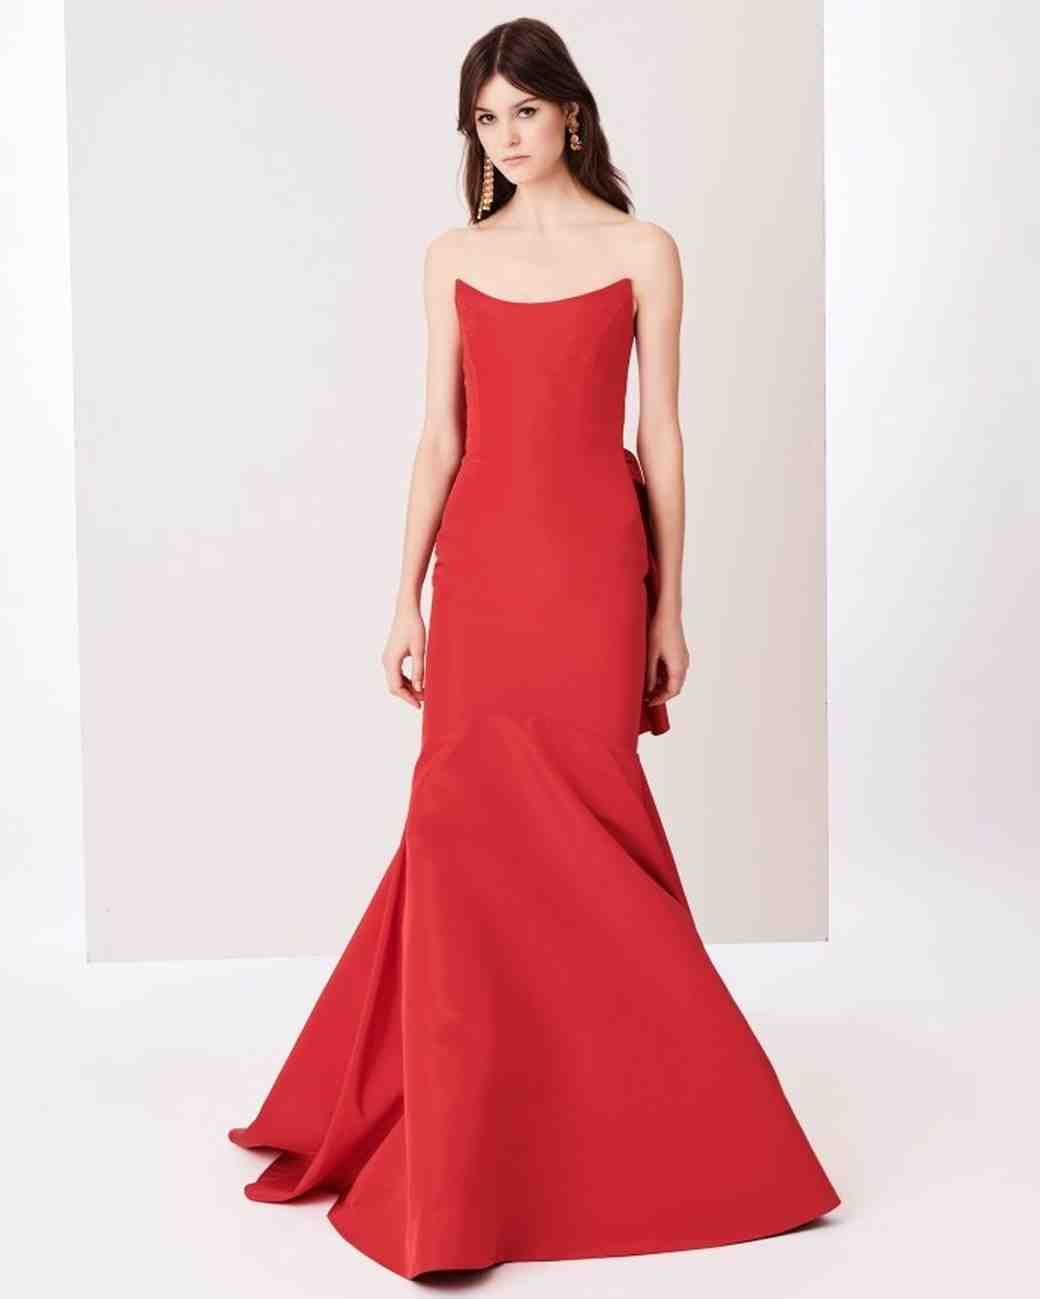 Silk Mother of the Bride Dress, Red Oscar de la Renta Gown